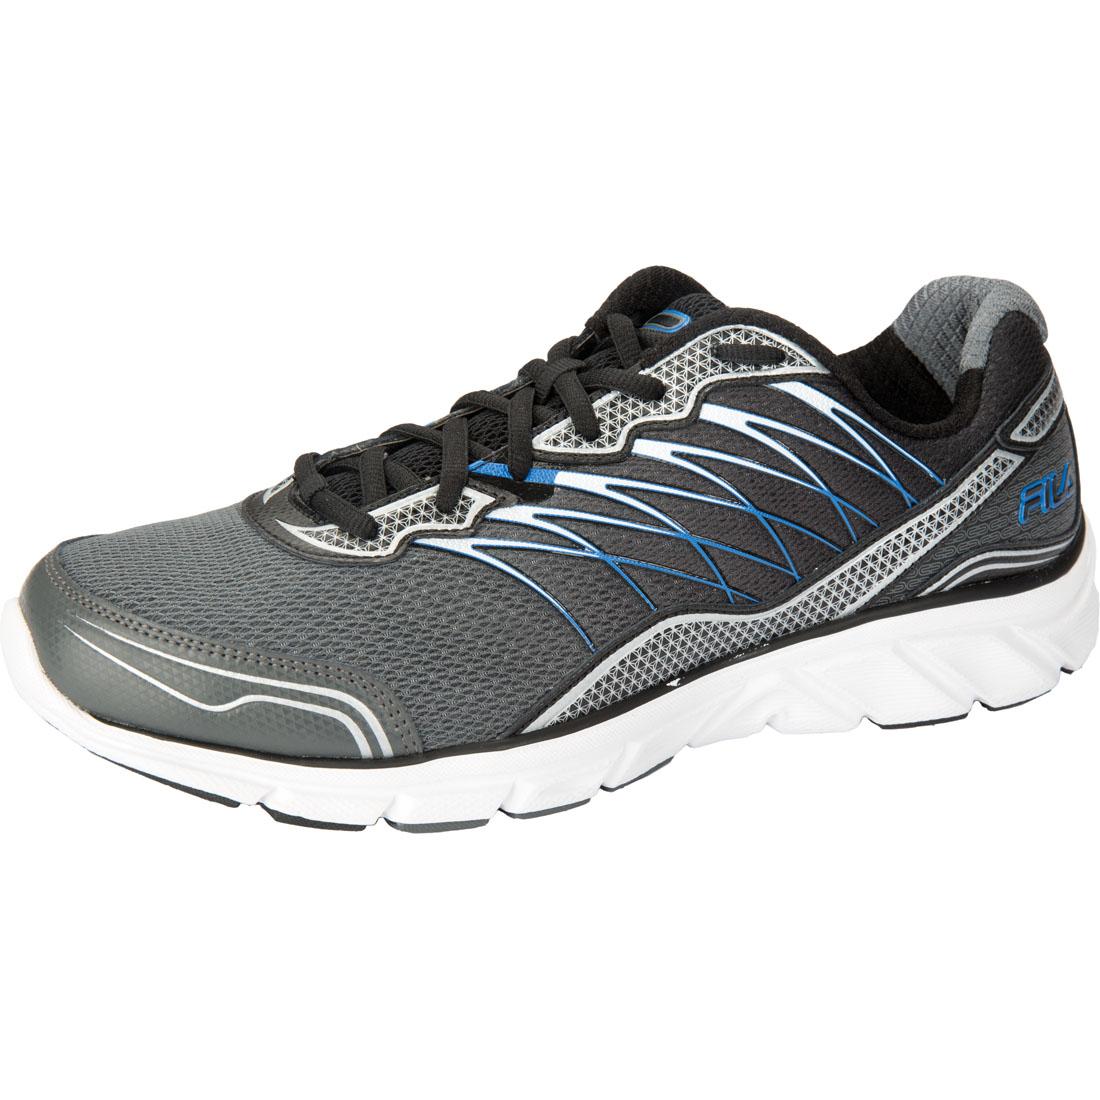 athletic footwear mcountdown2 f057 from scrubs4all